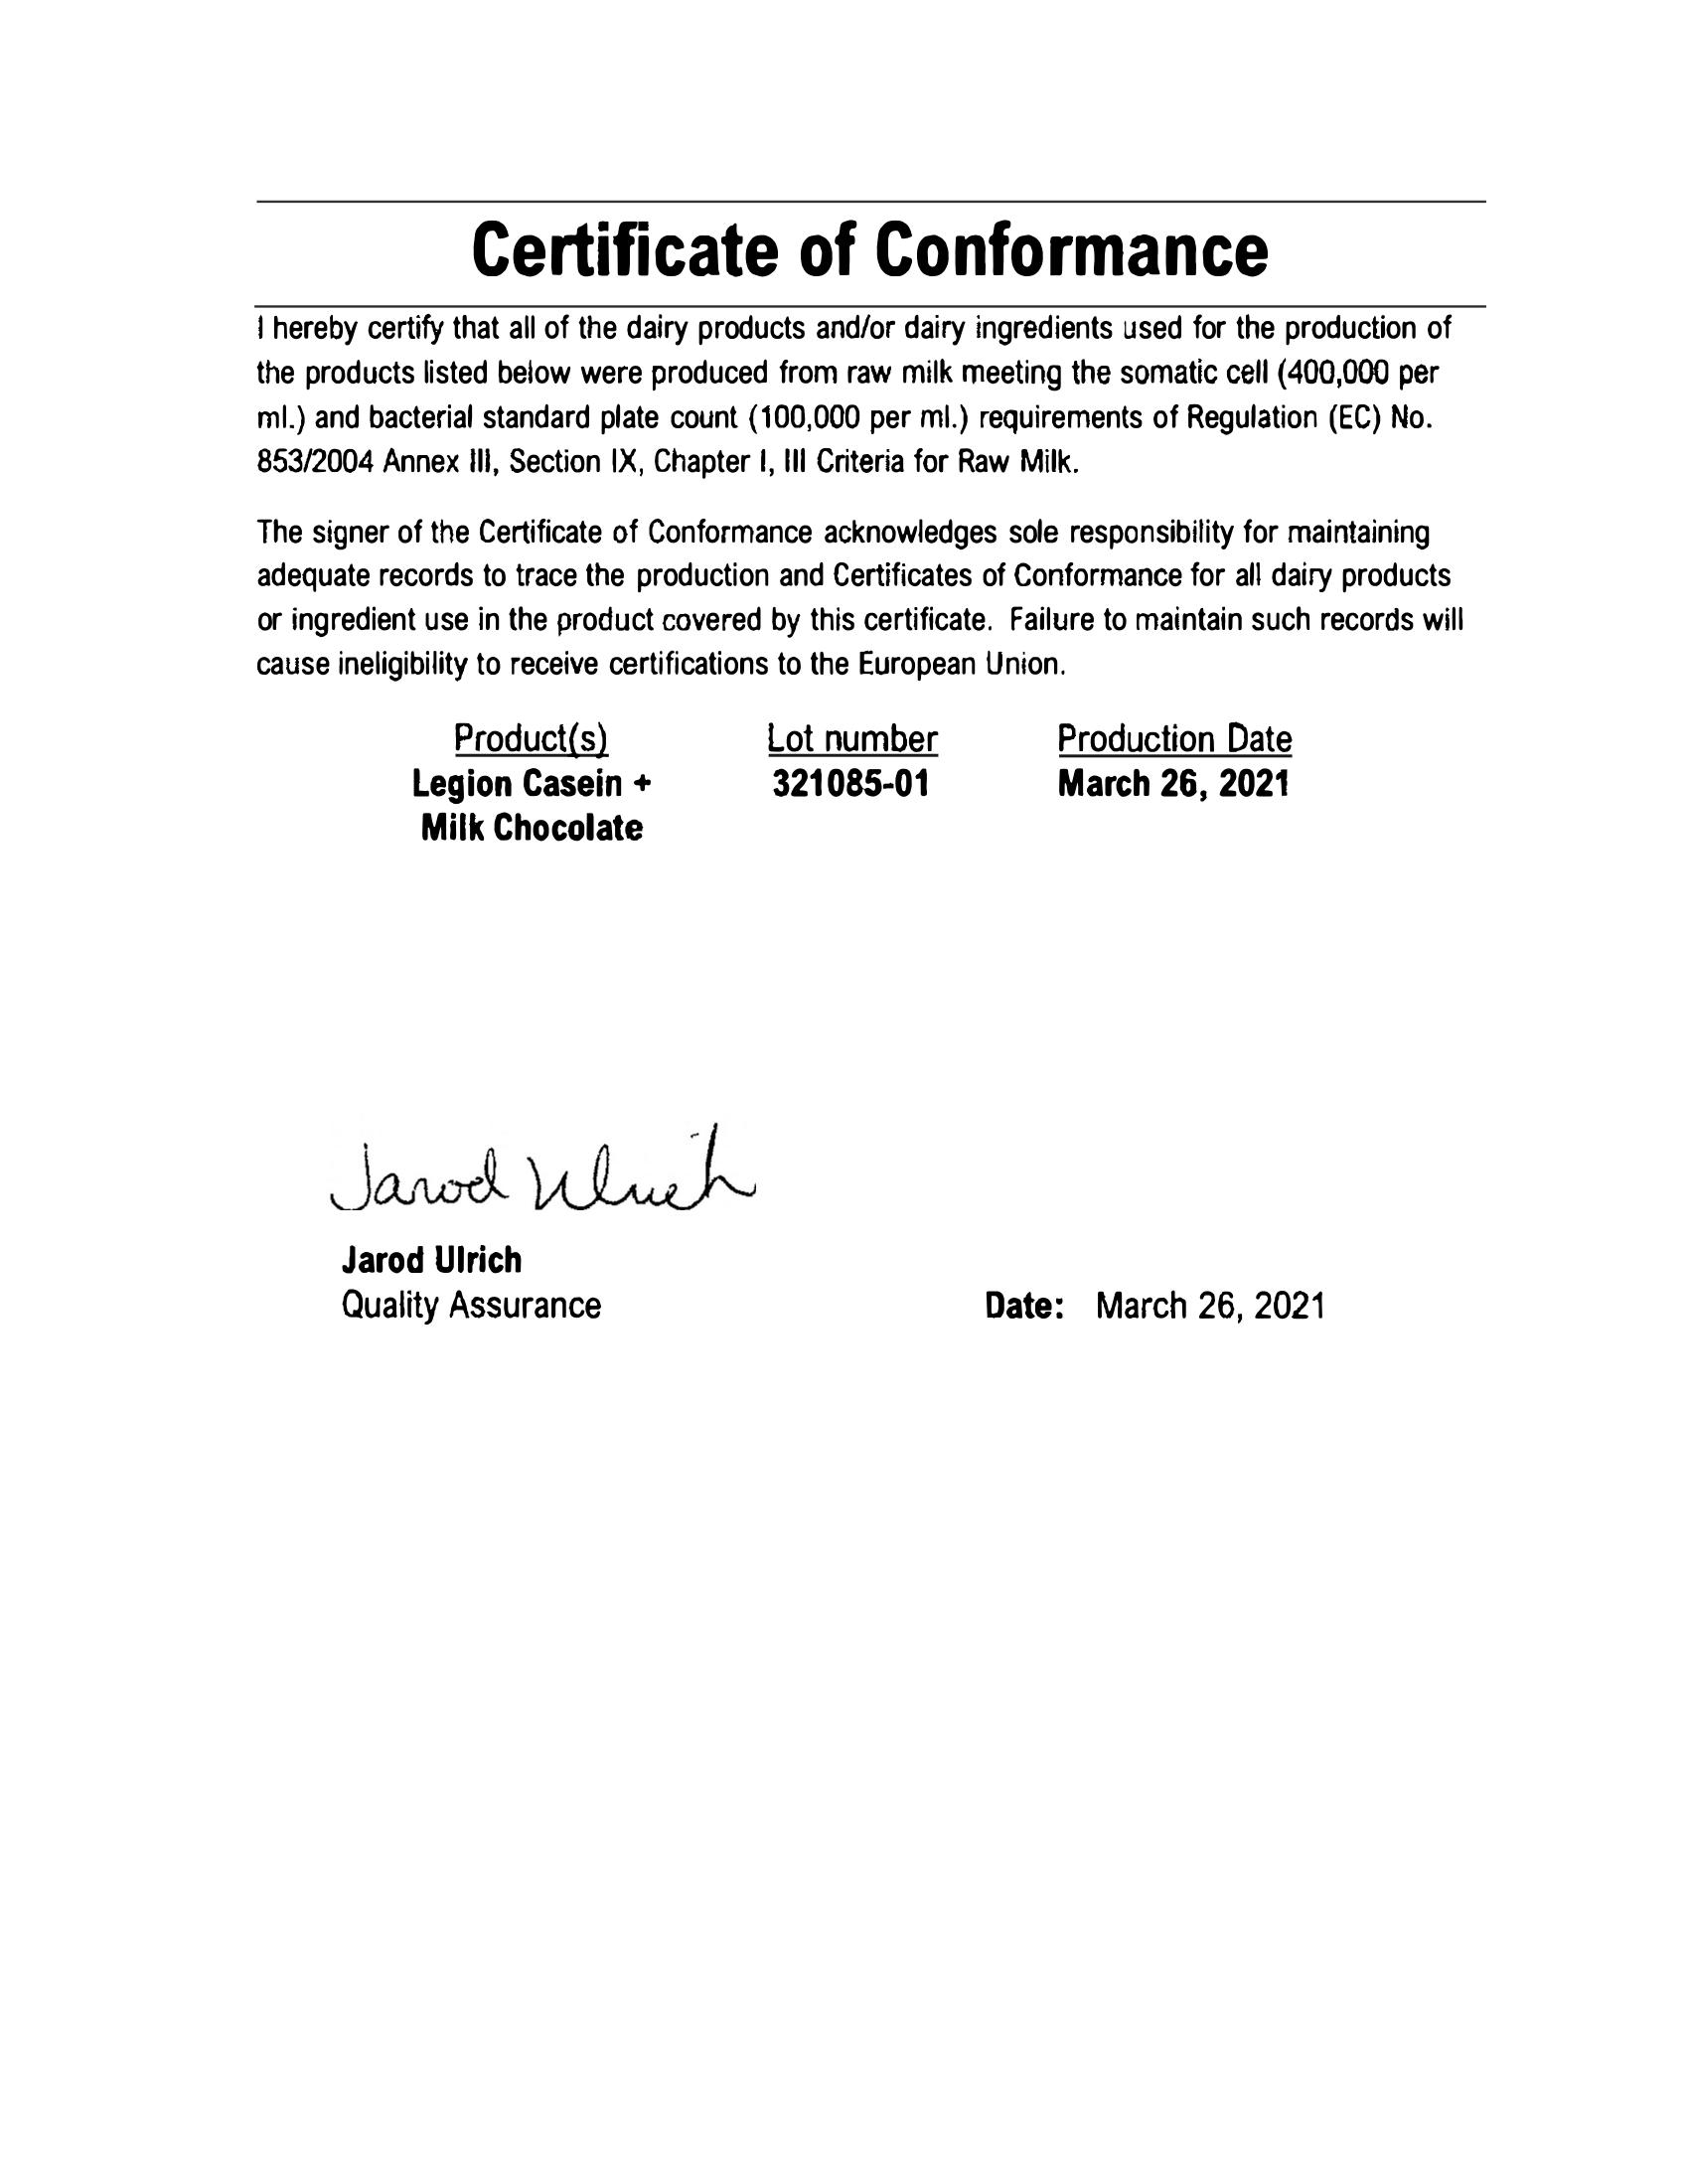 Casein Lab Test Certificate Page 2